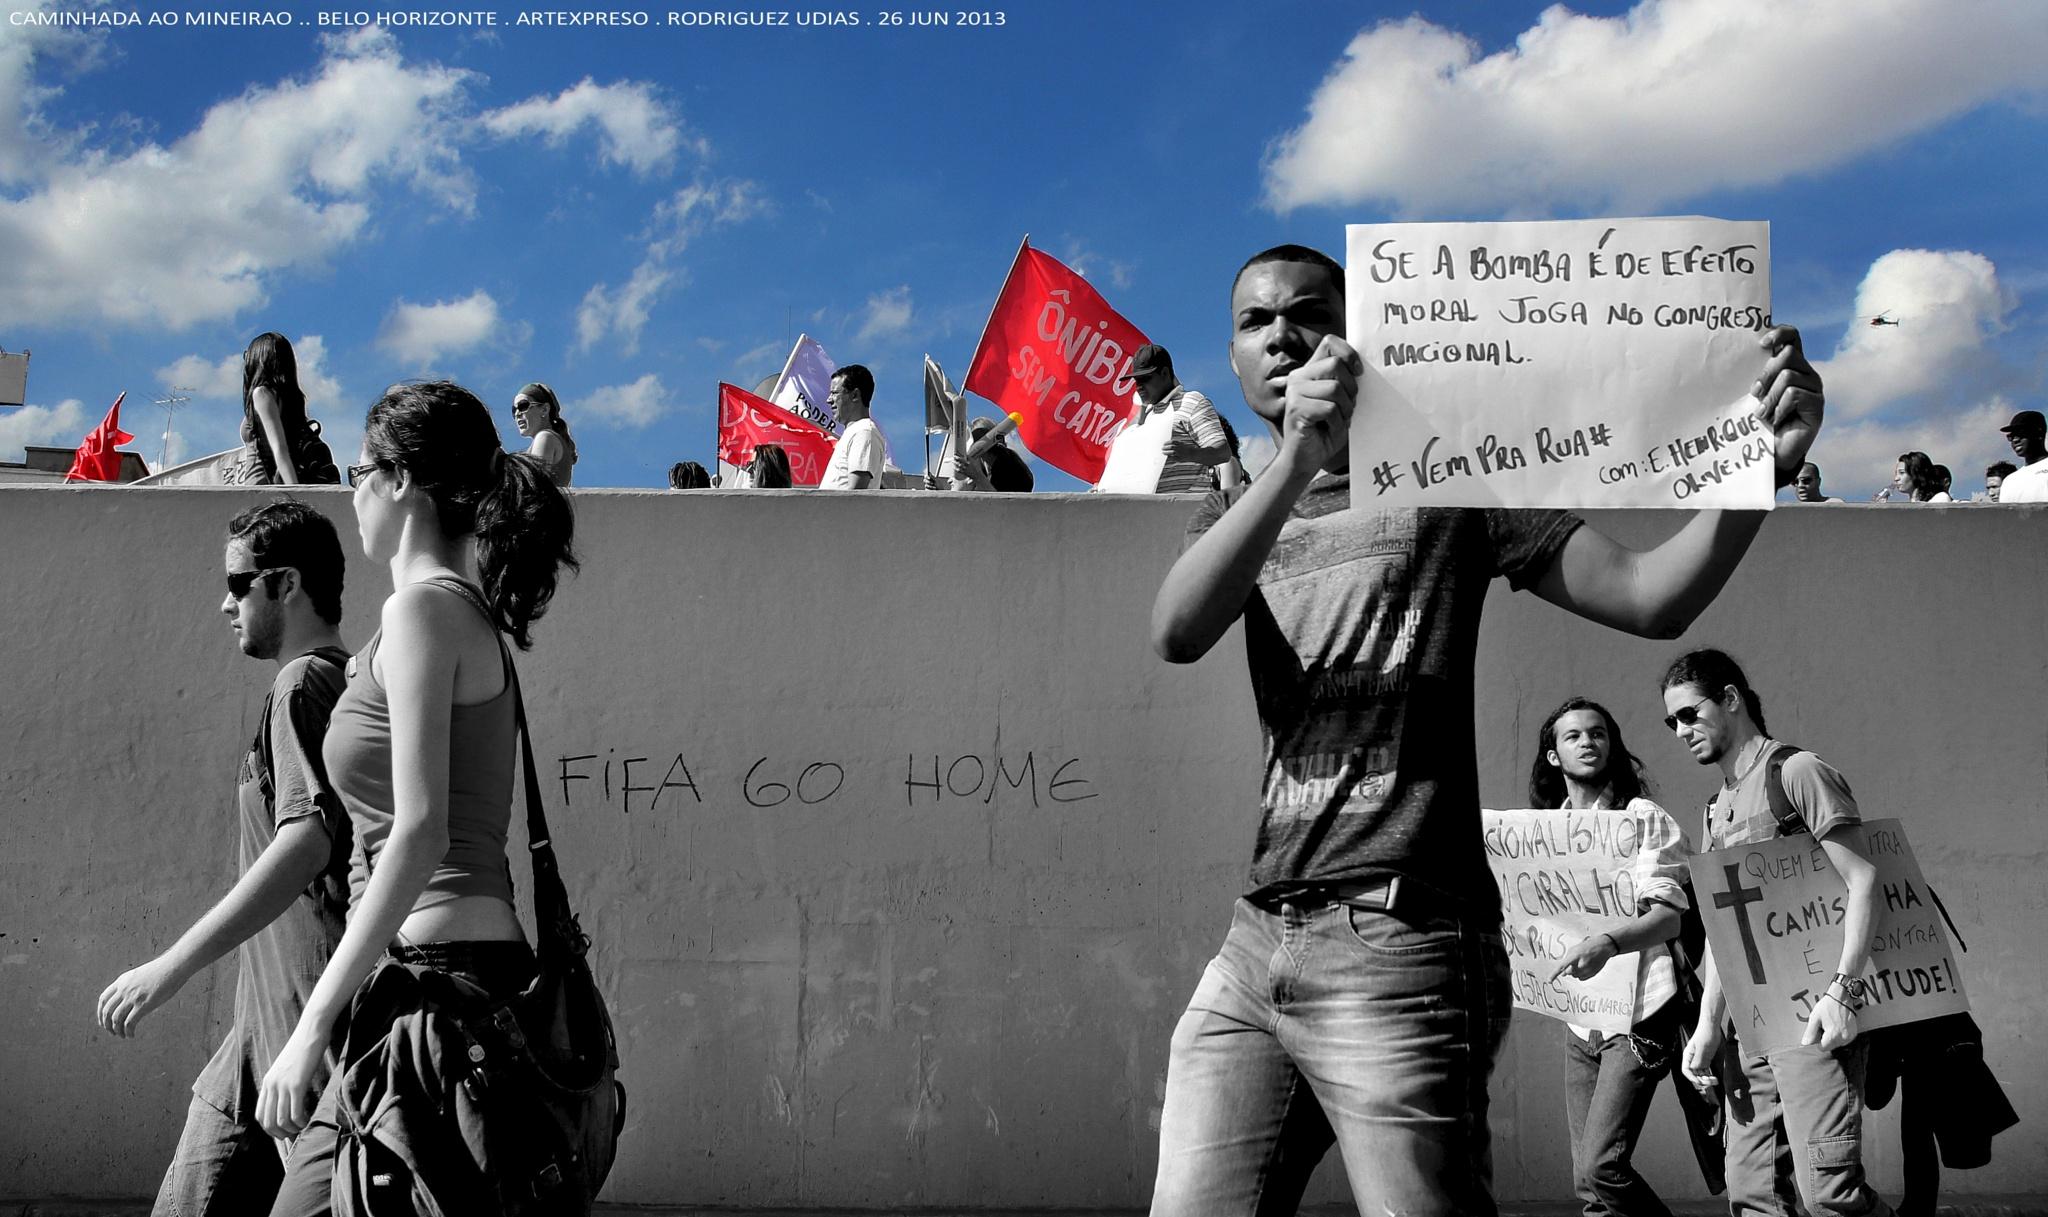 Journalismcontest 03 / Artexpreso .. by  Artexpreso